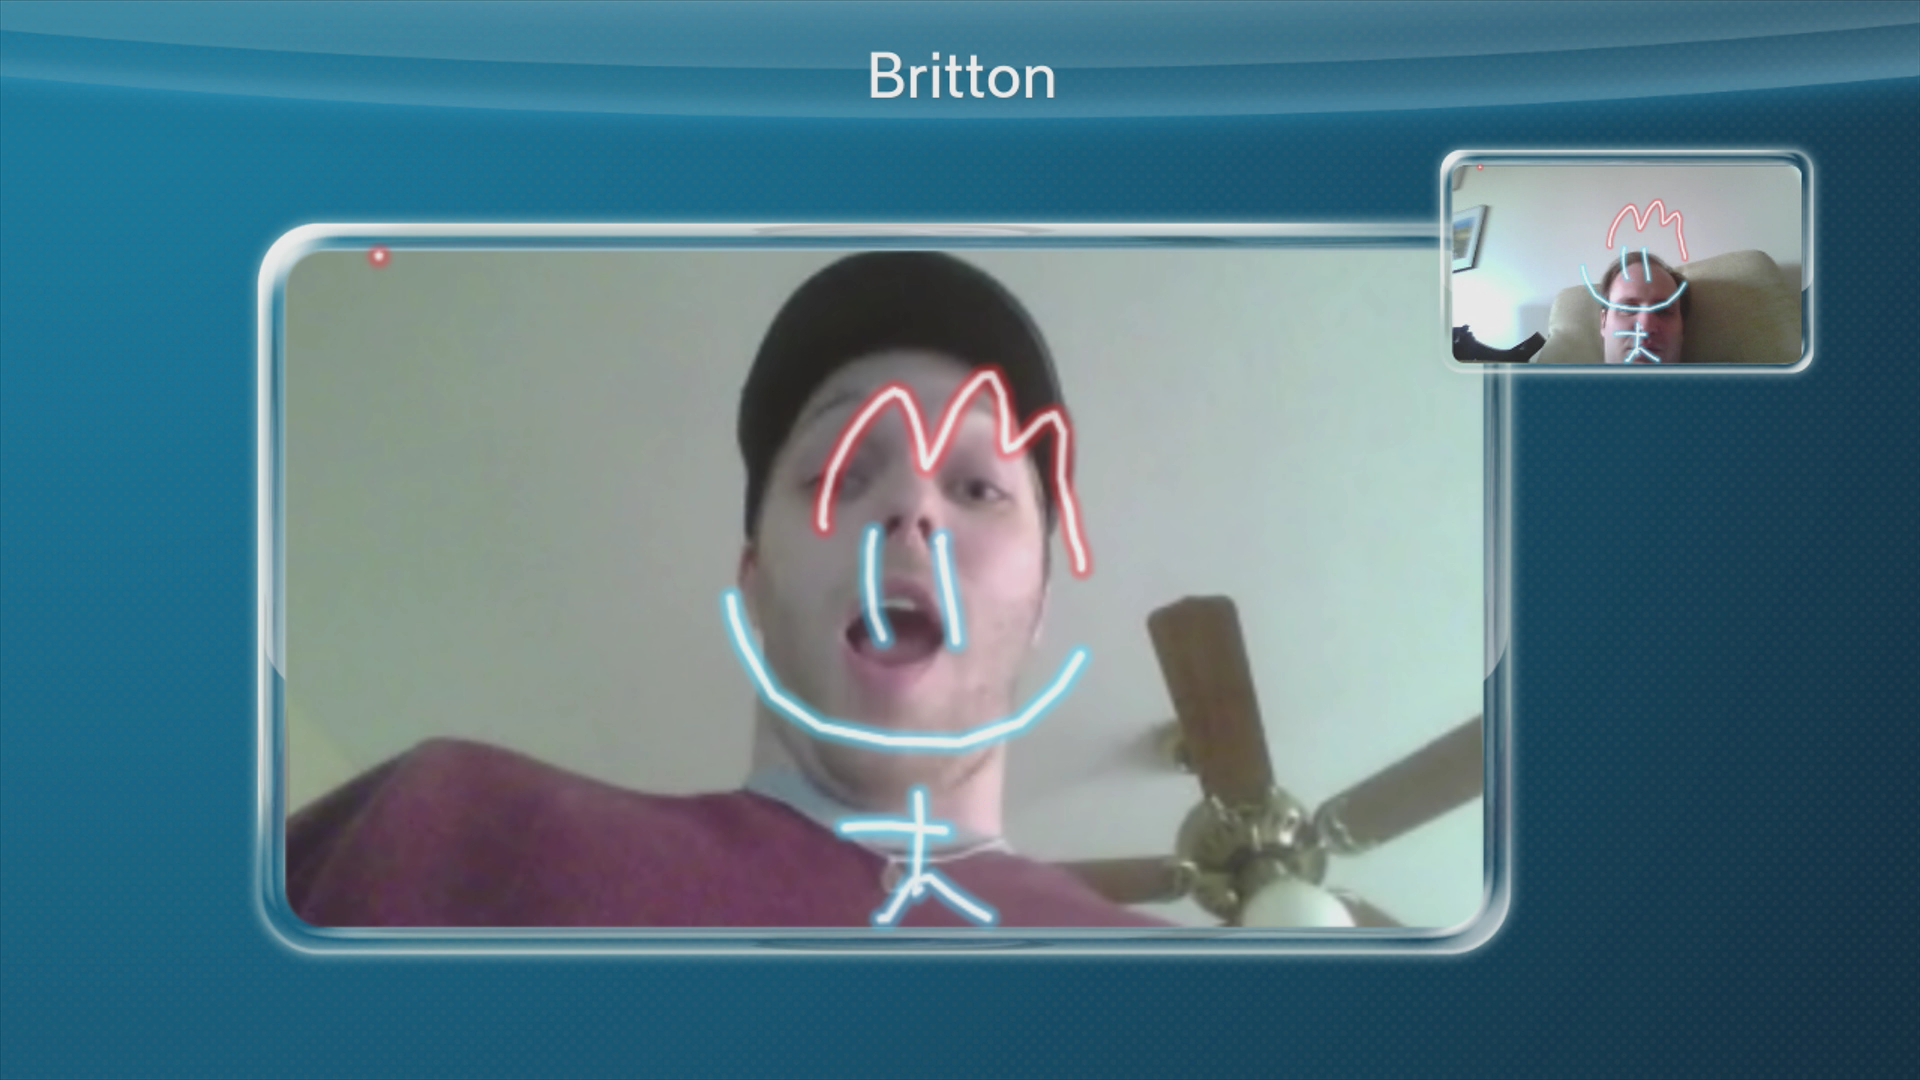 I drew a funny face on fellow game journalist Britton Peele. Lulz.